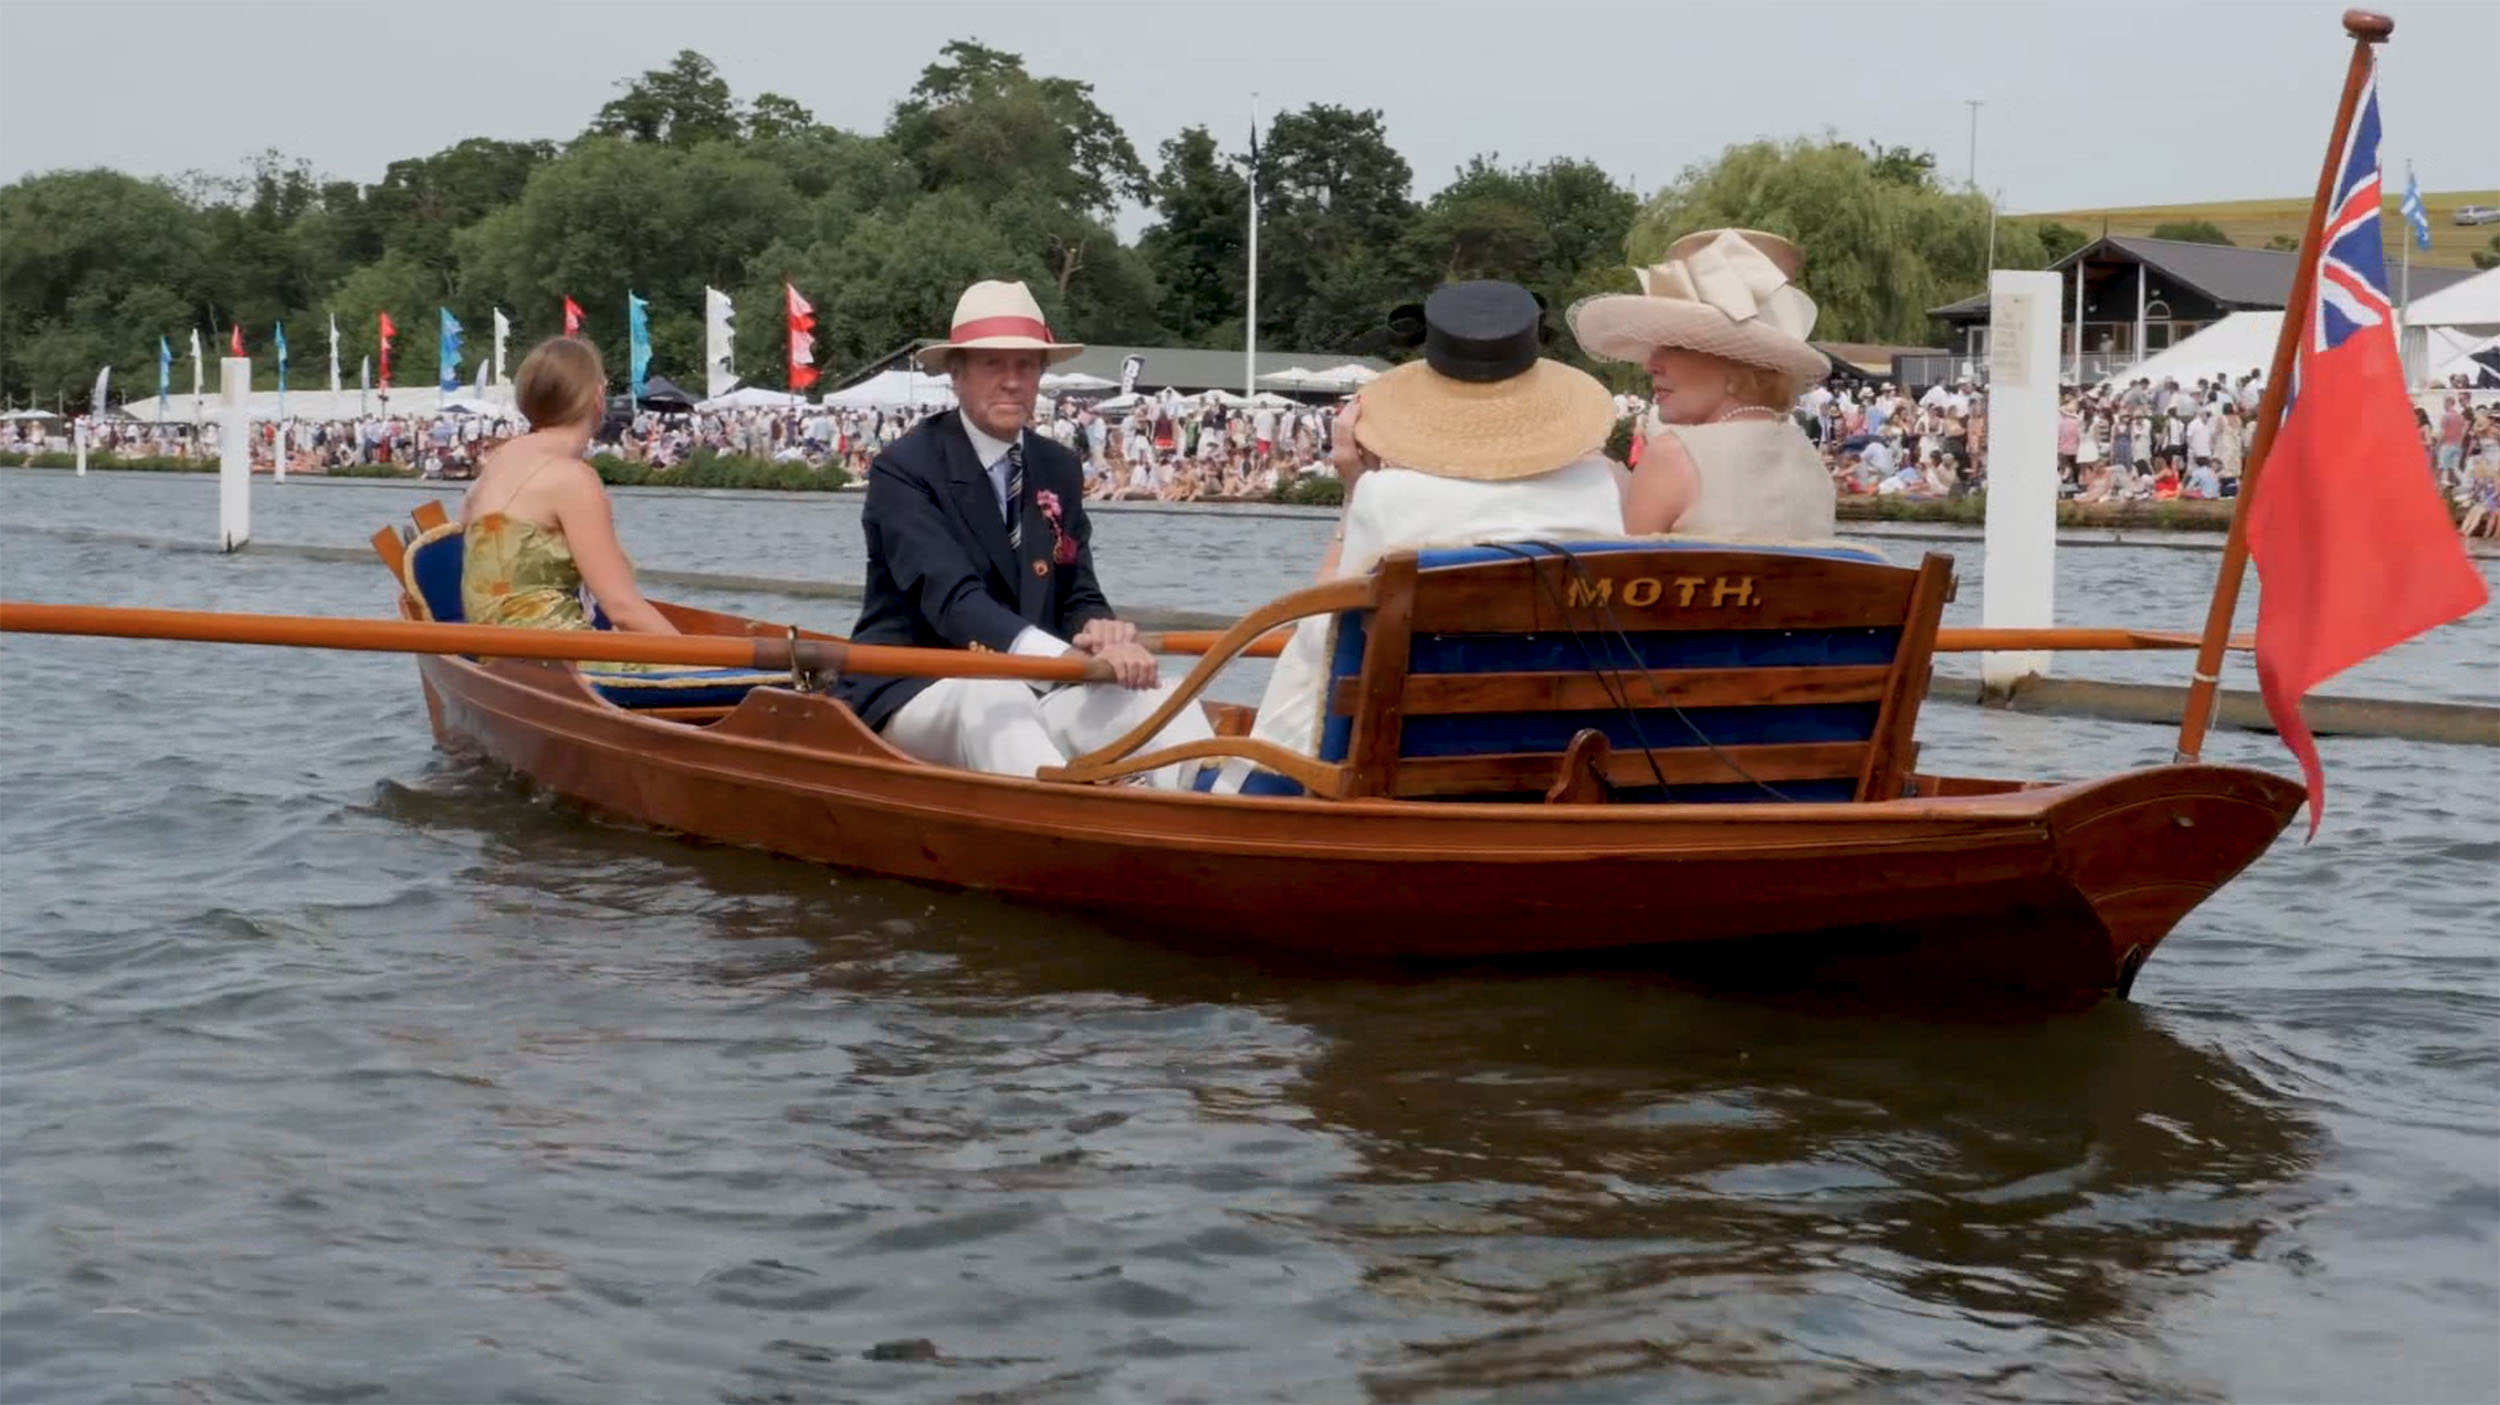 Henley Town Council - Man piloting boat down Henley river